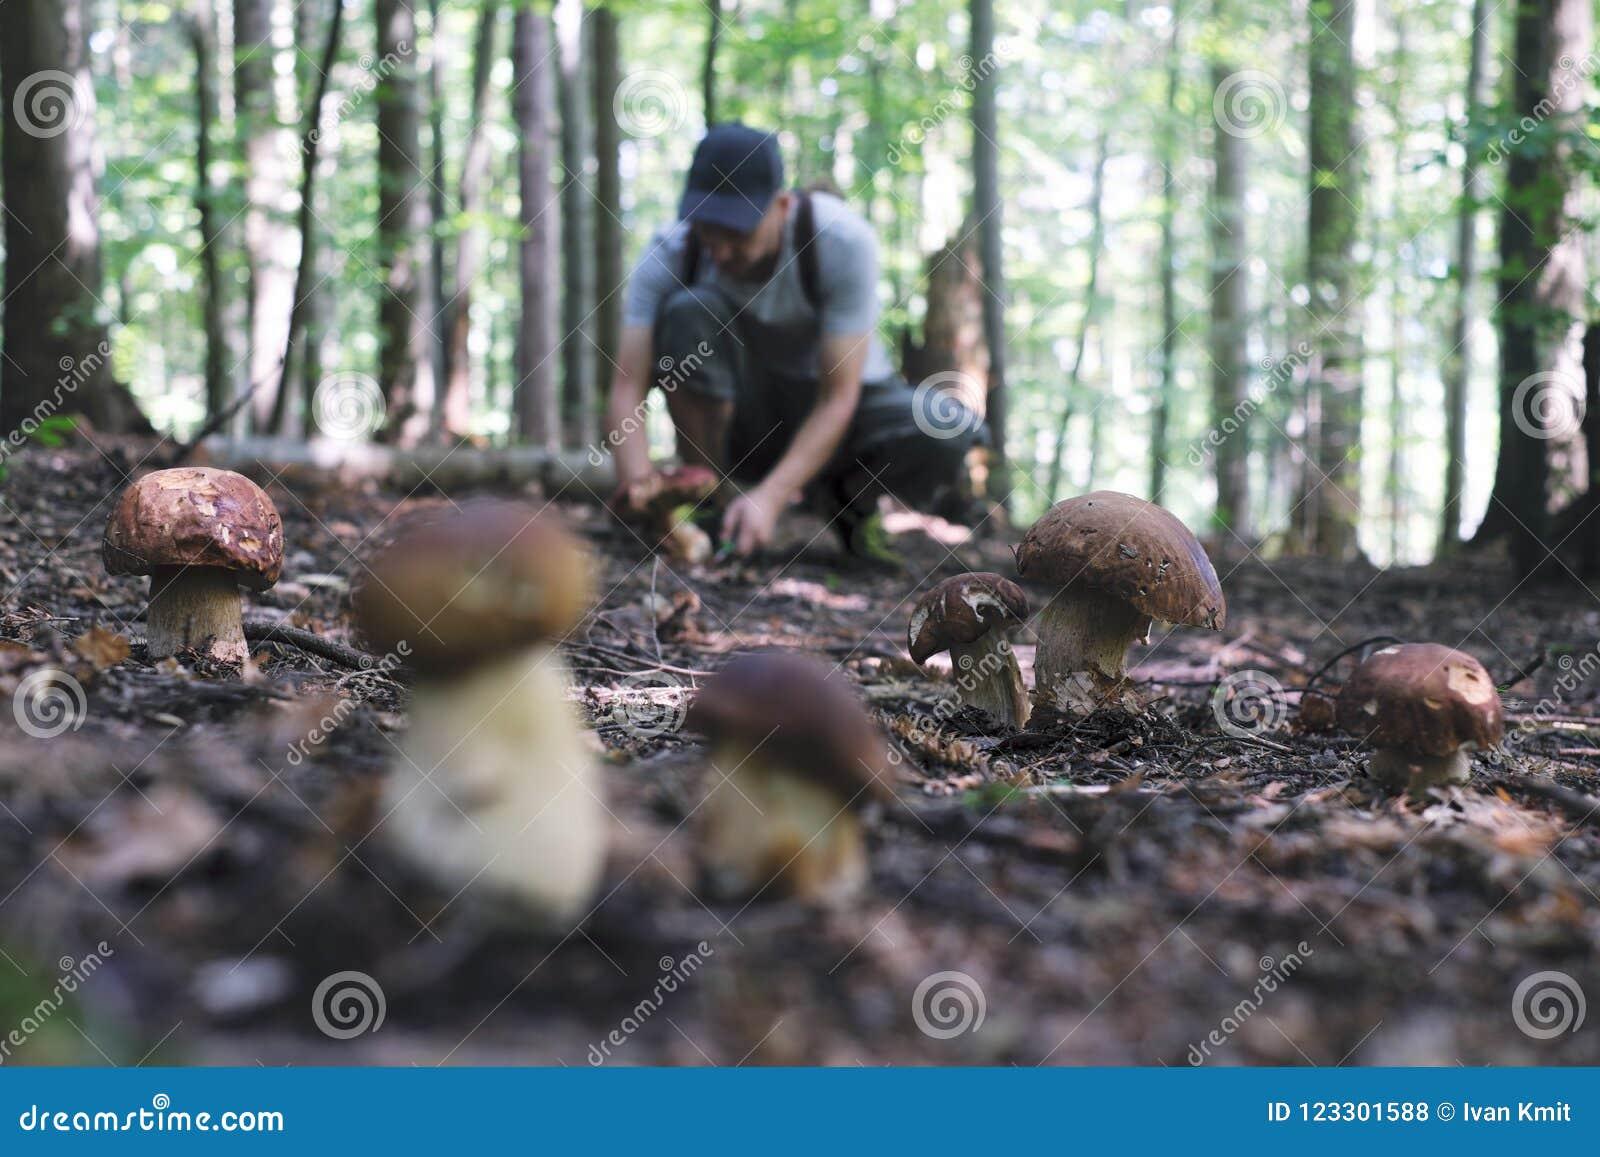 L uomo raccoglie i funghi